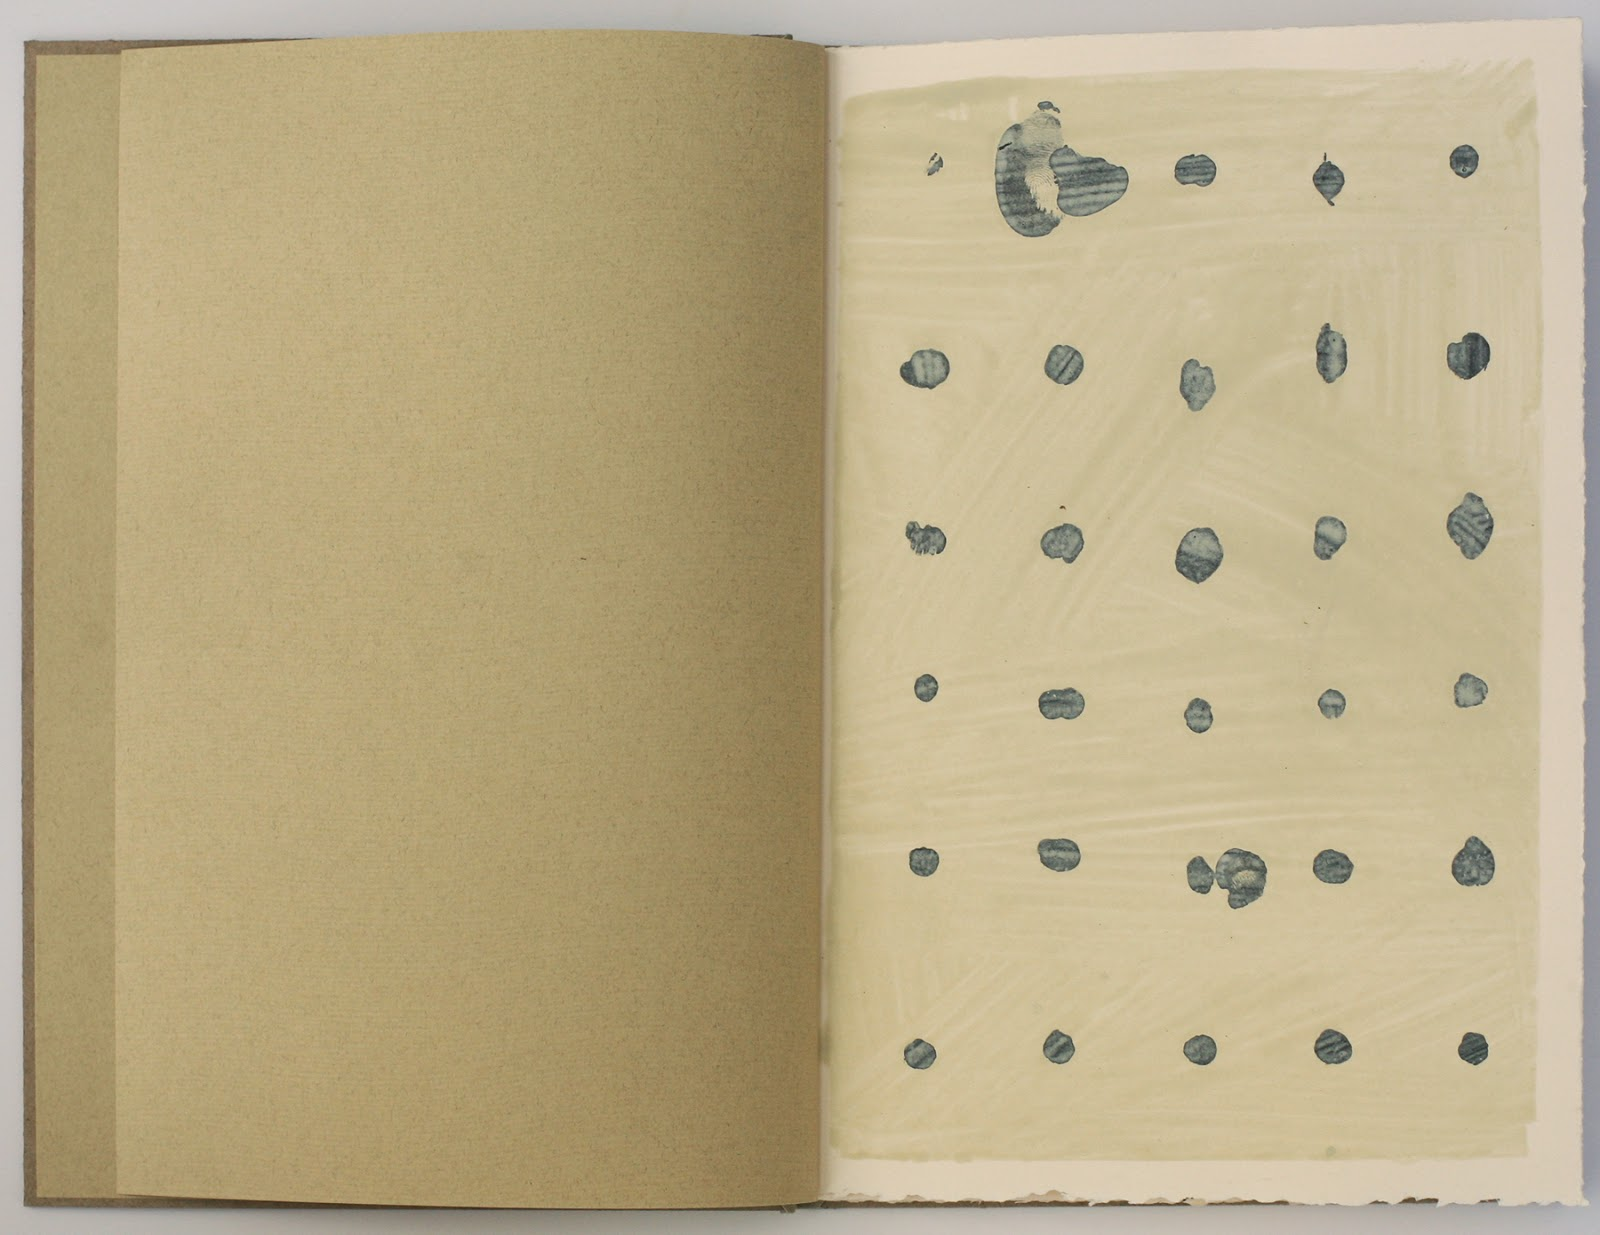 G.LEKEU, book, 2014